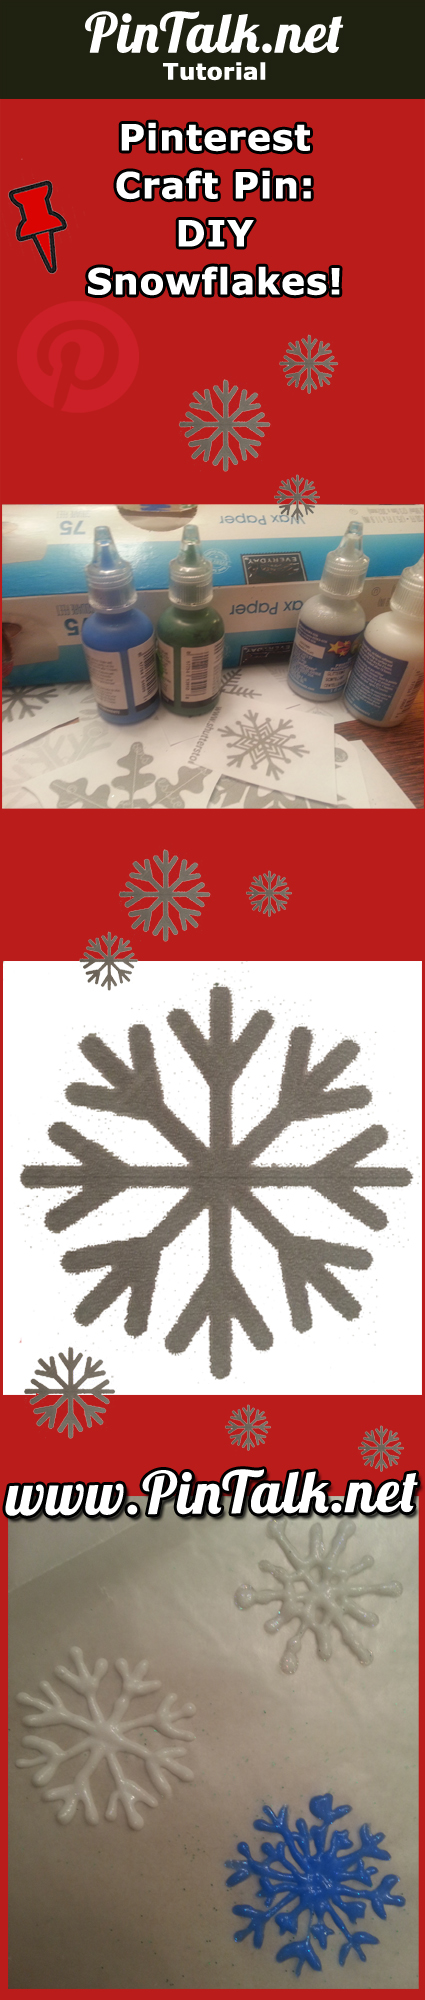 Pinterest-Craft-Pin-DIY-Snowflakes-pin